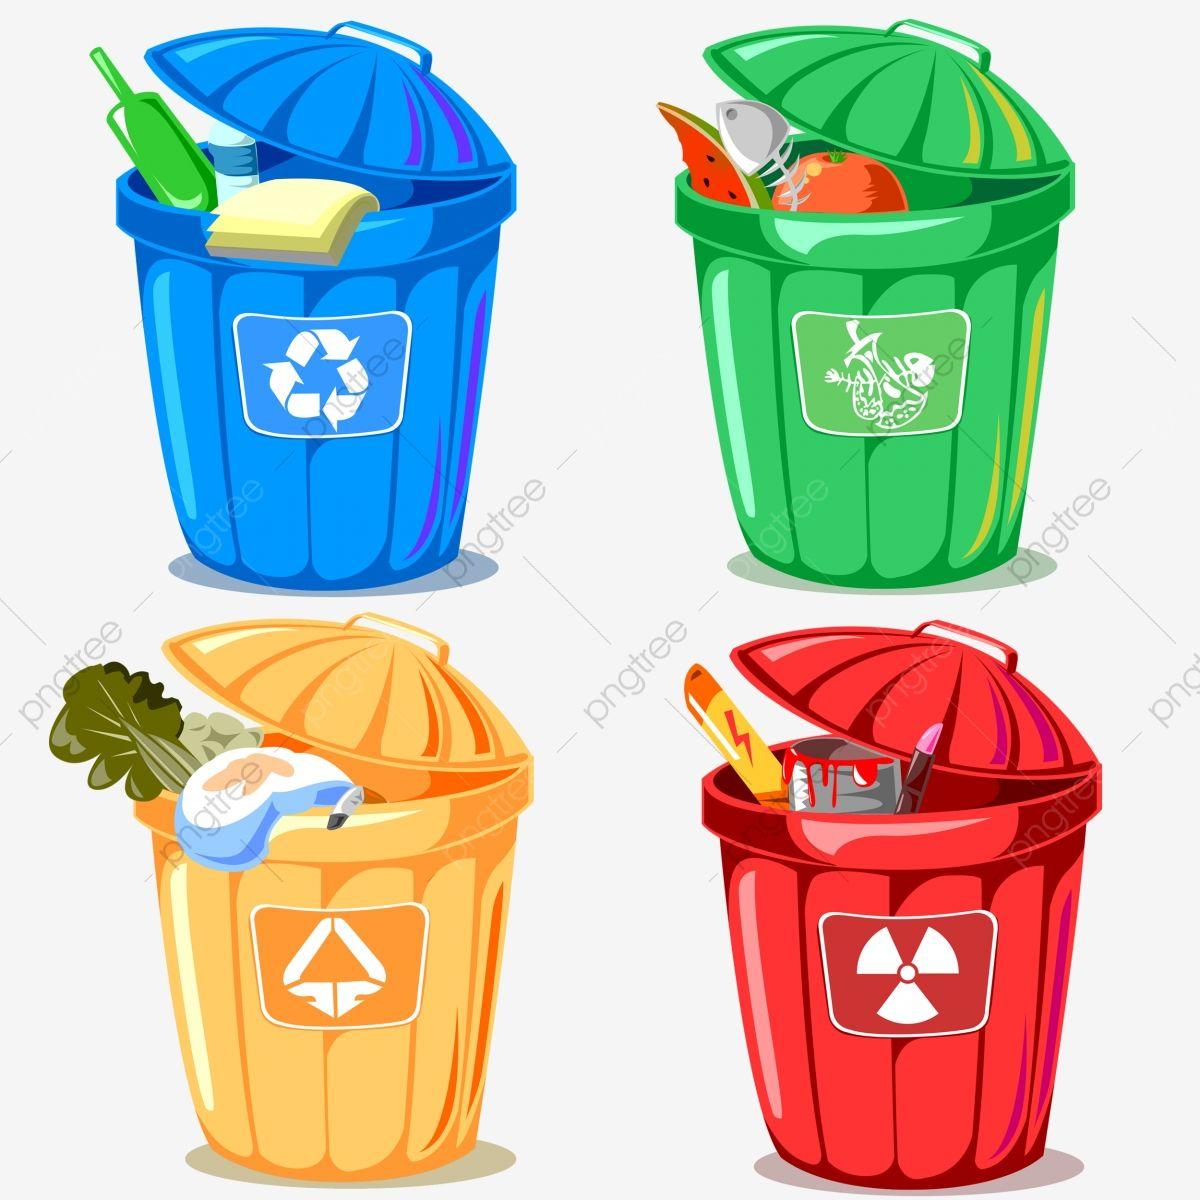 Cartoon Environmental Protection Rubbish Trash Can Trash Can Environmental Trash Can Environmental Theme Png Transparent Clipart Image And Psd File For Free Trash Can Can Clipart Cartoon Clip Art